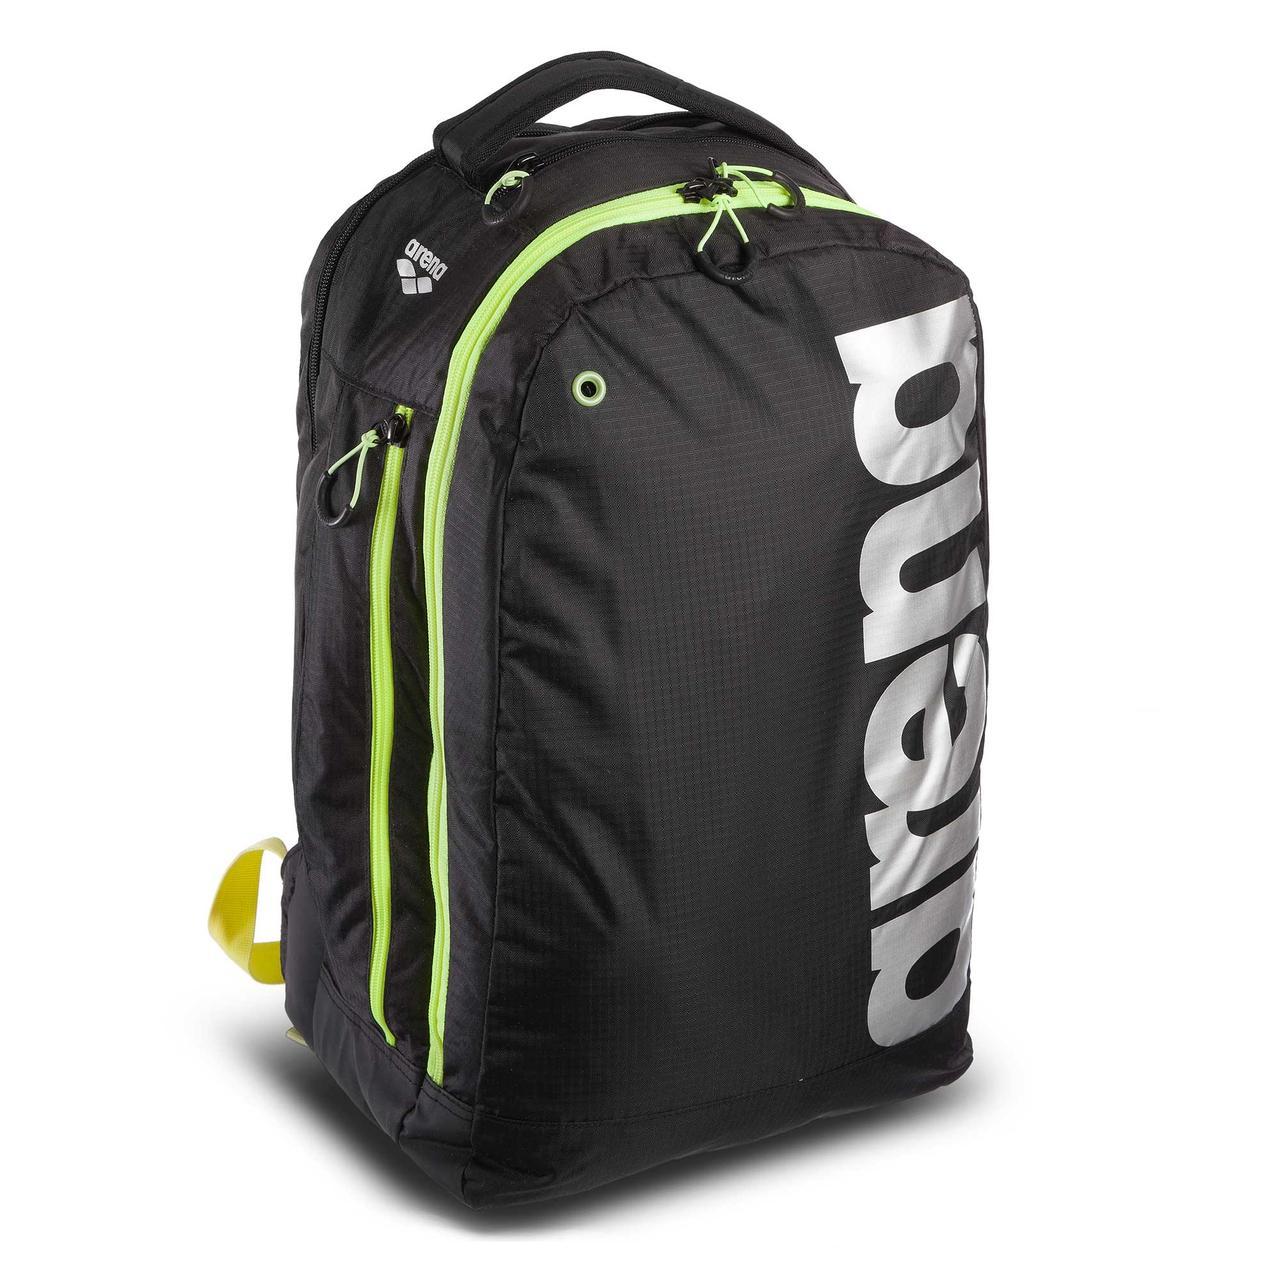 Рюкзак спортивний ARENA AR-1E359-50 FAST URBAN BACKPACK (поліестер, V-32л, р-р 20х50х30см, чорний-салатовий)